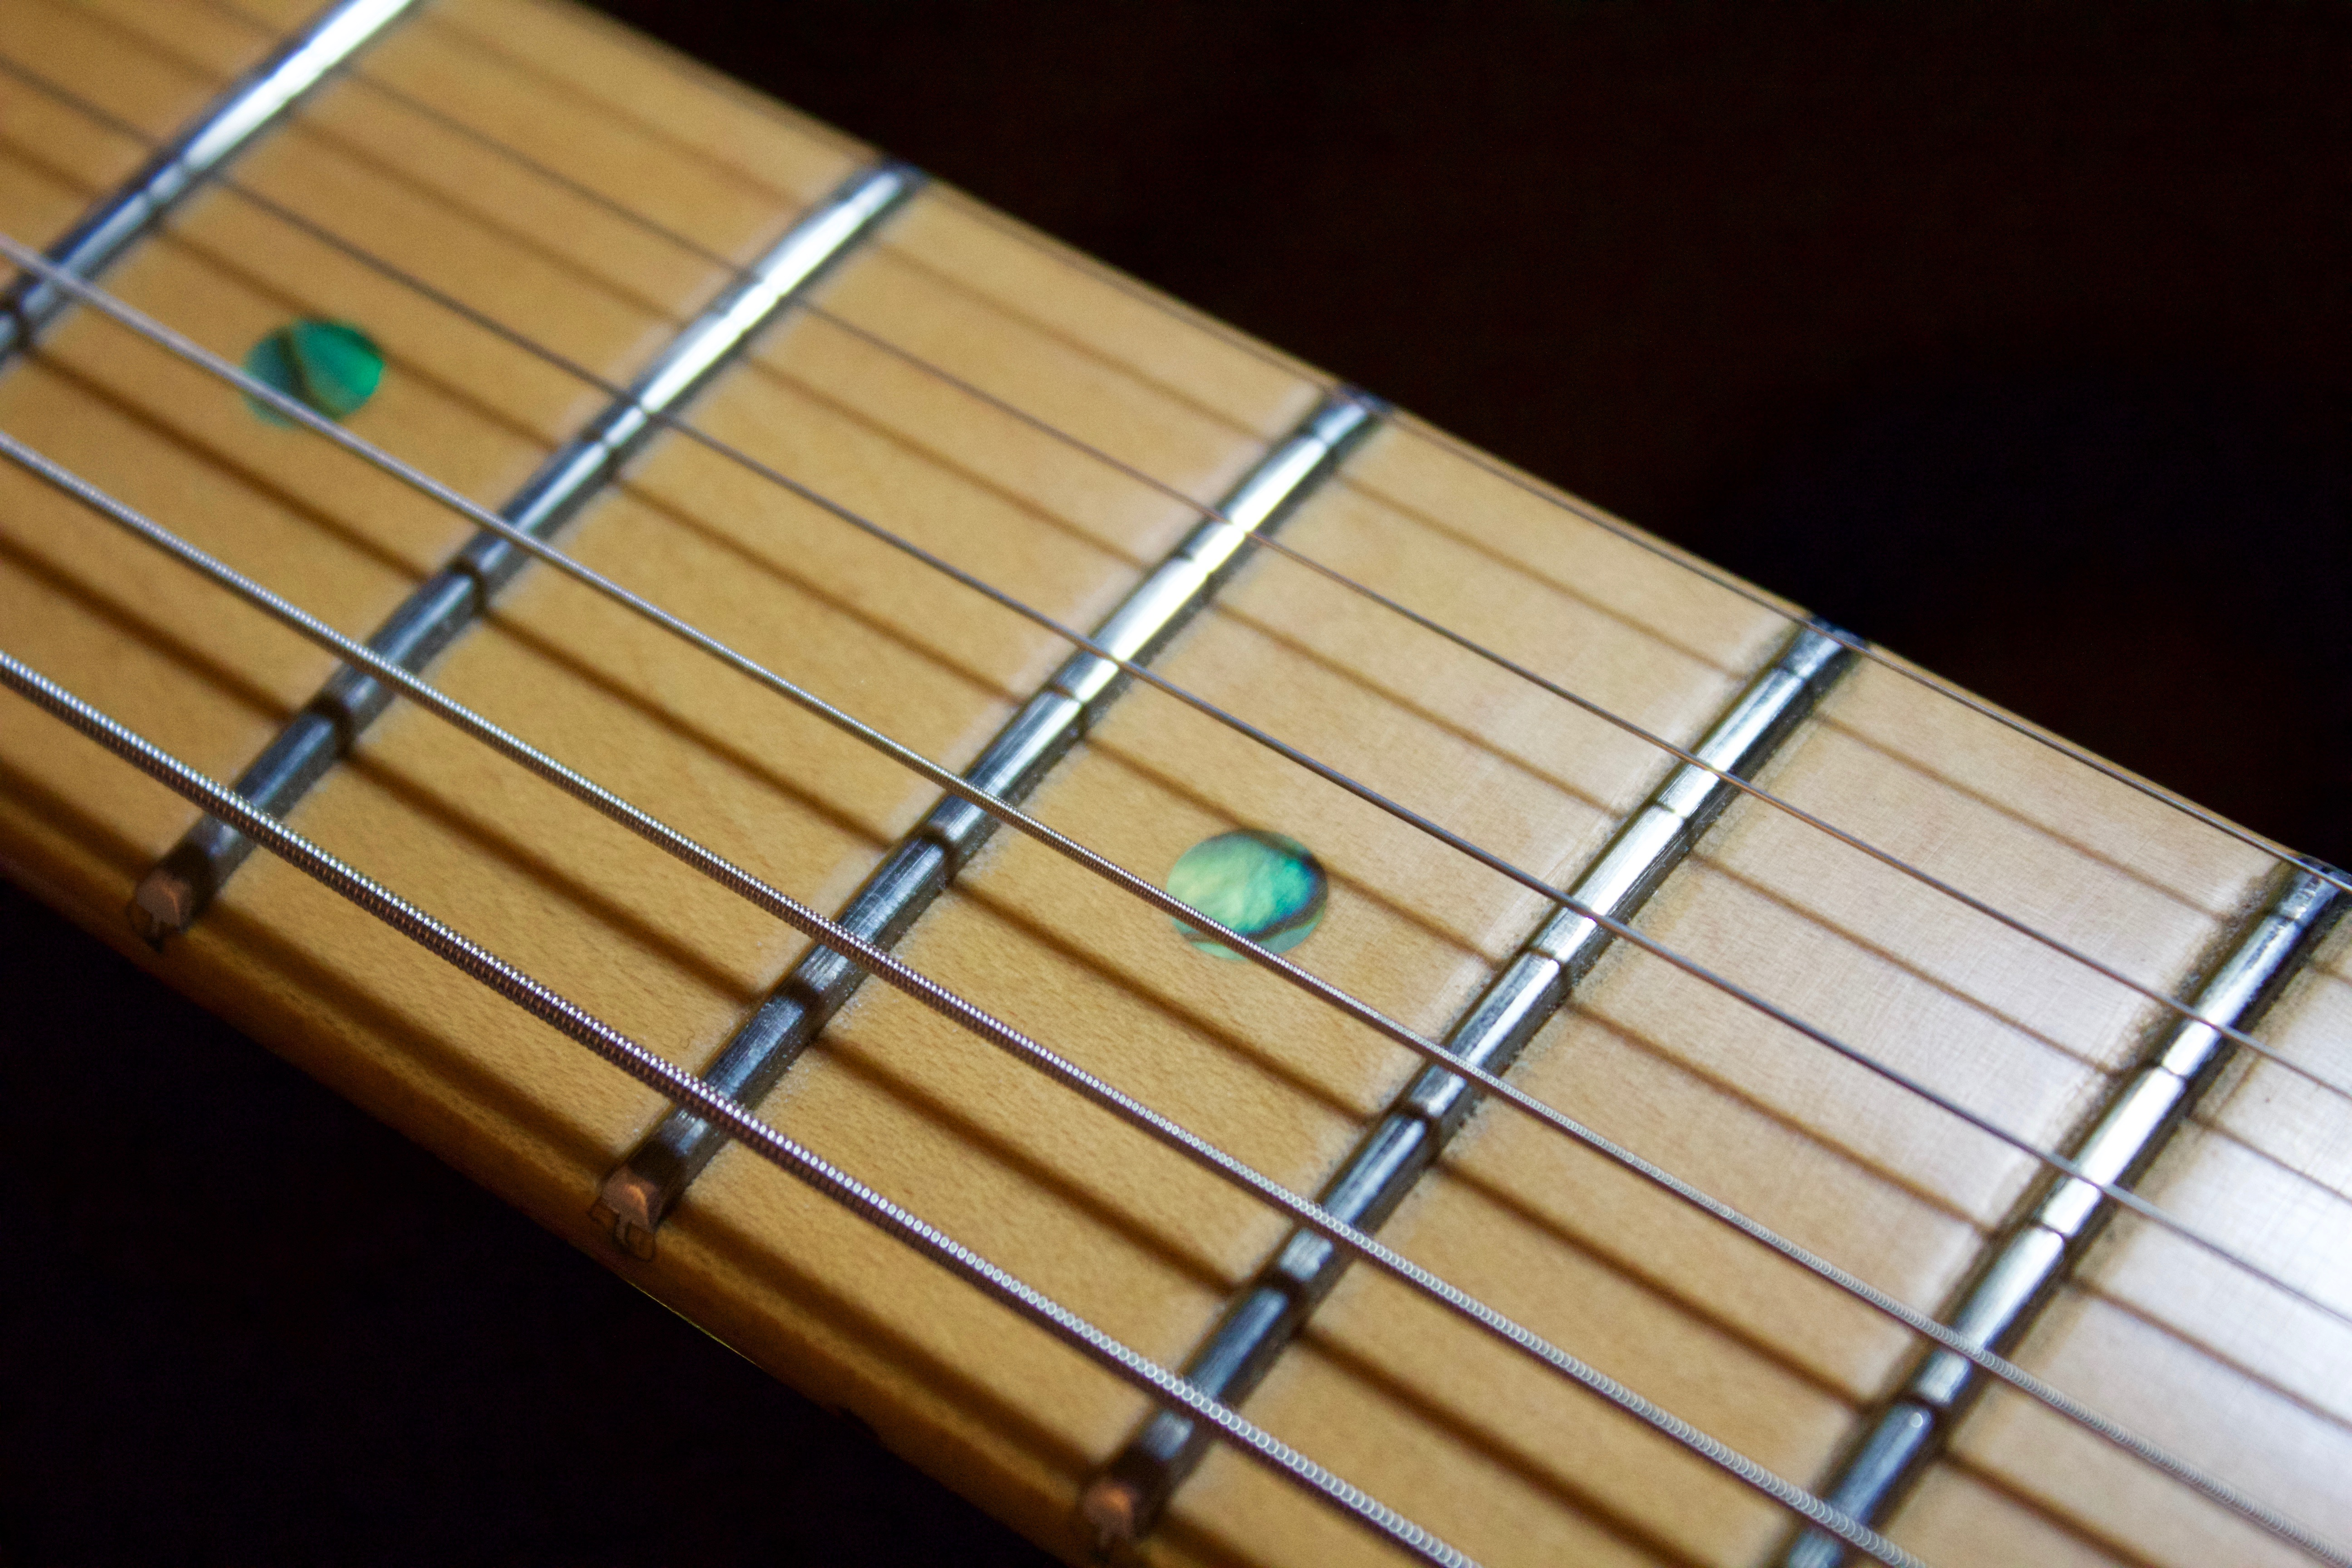 A Maple guitar fingerboard